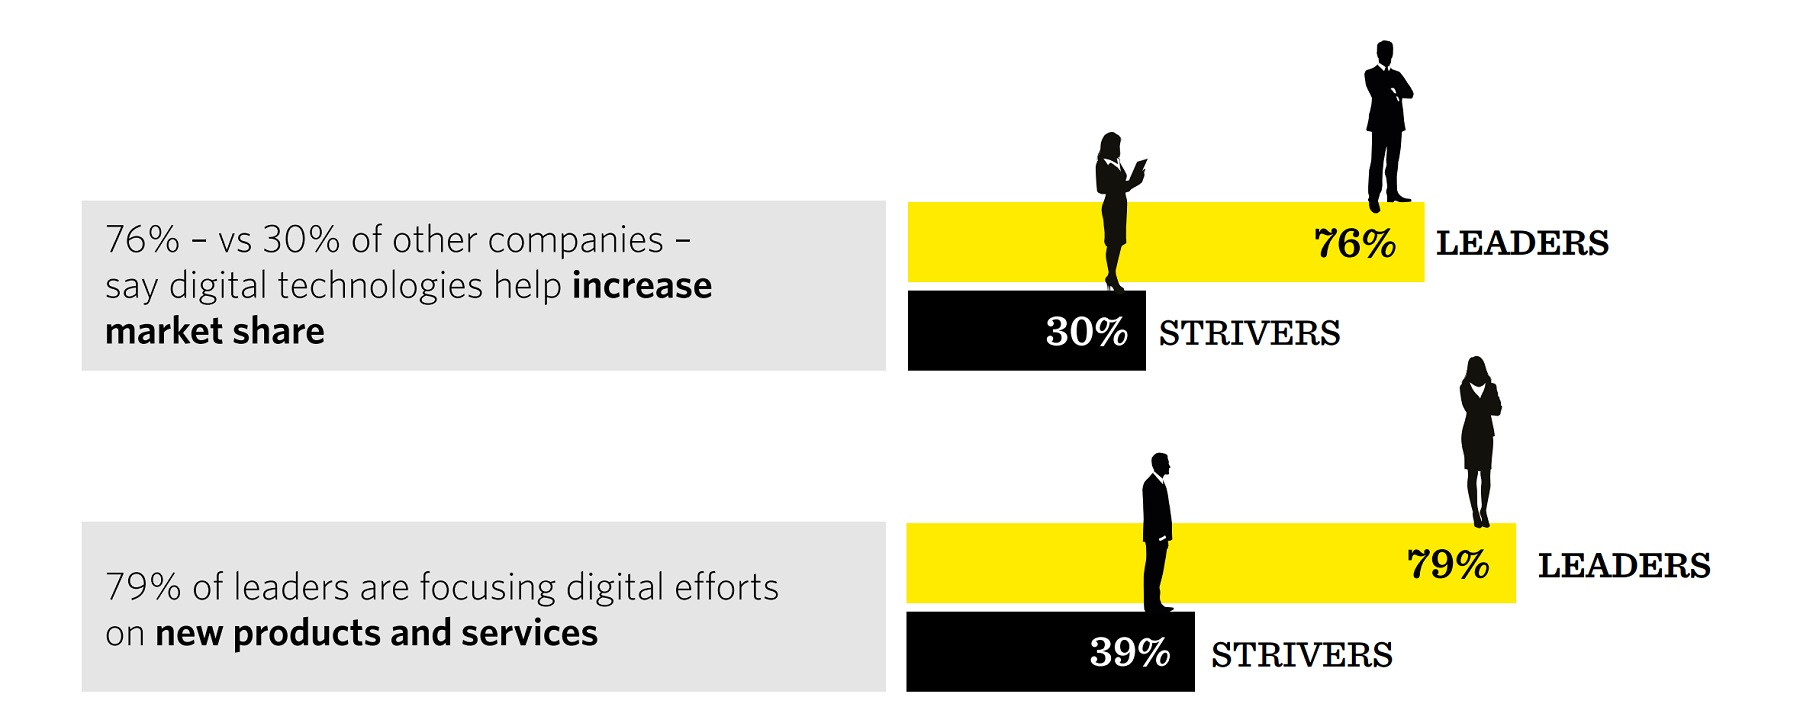 New research suggests many companies are unprepared for digital disruption TechNative